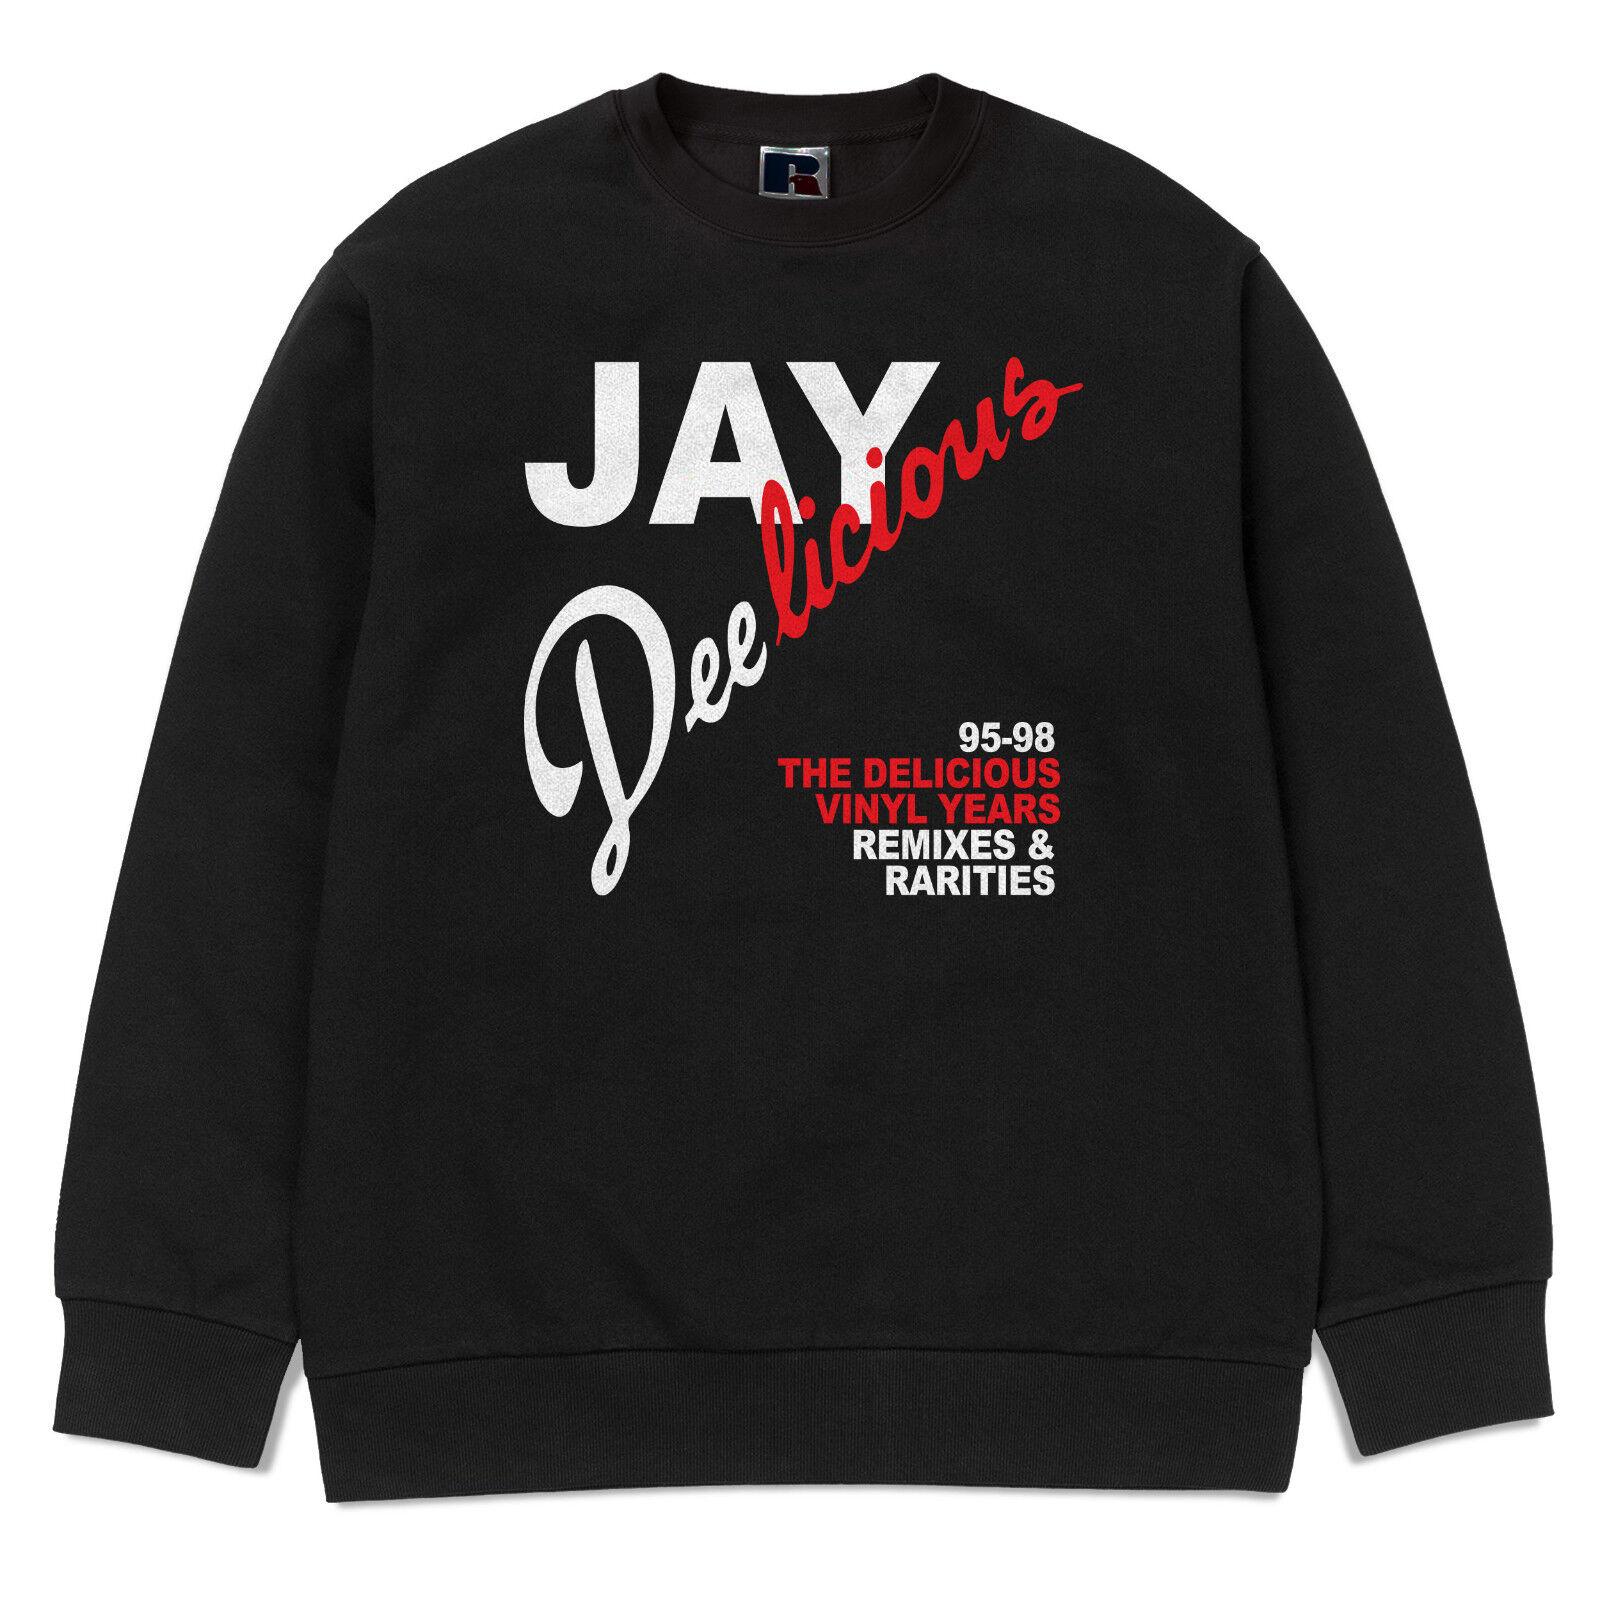 J Dilla Sweatshirt - Hip Hop, Jay Dee LICIOUS, Jay Dee, Detroit Rap Sweatshirt